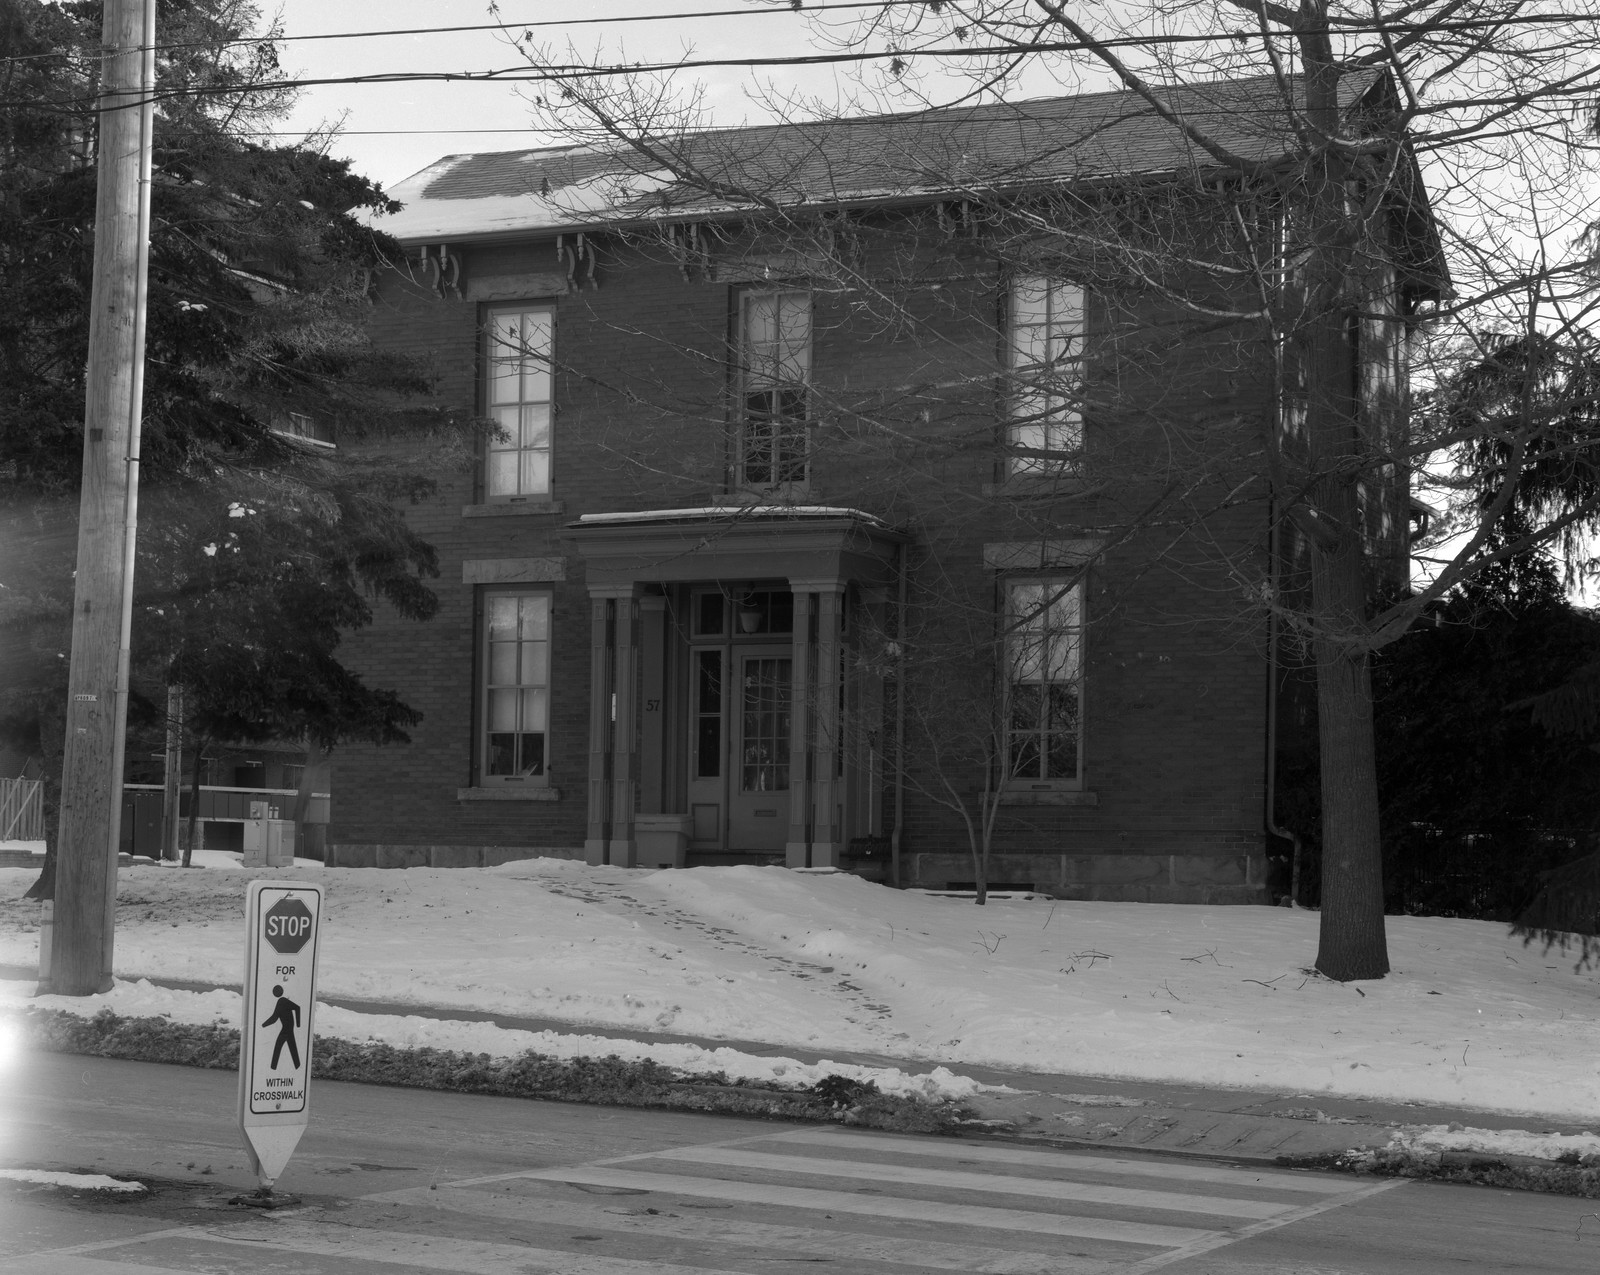 HomeTown - 03 - Martin's Mills